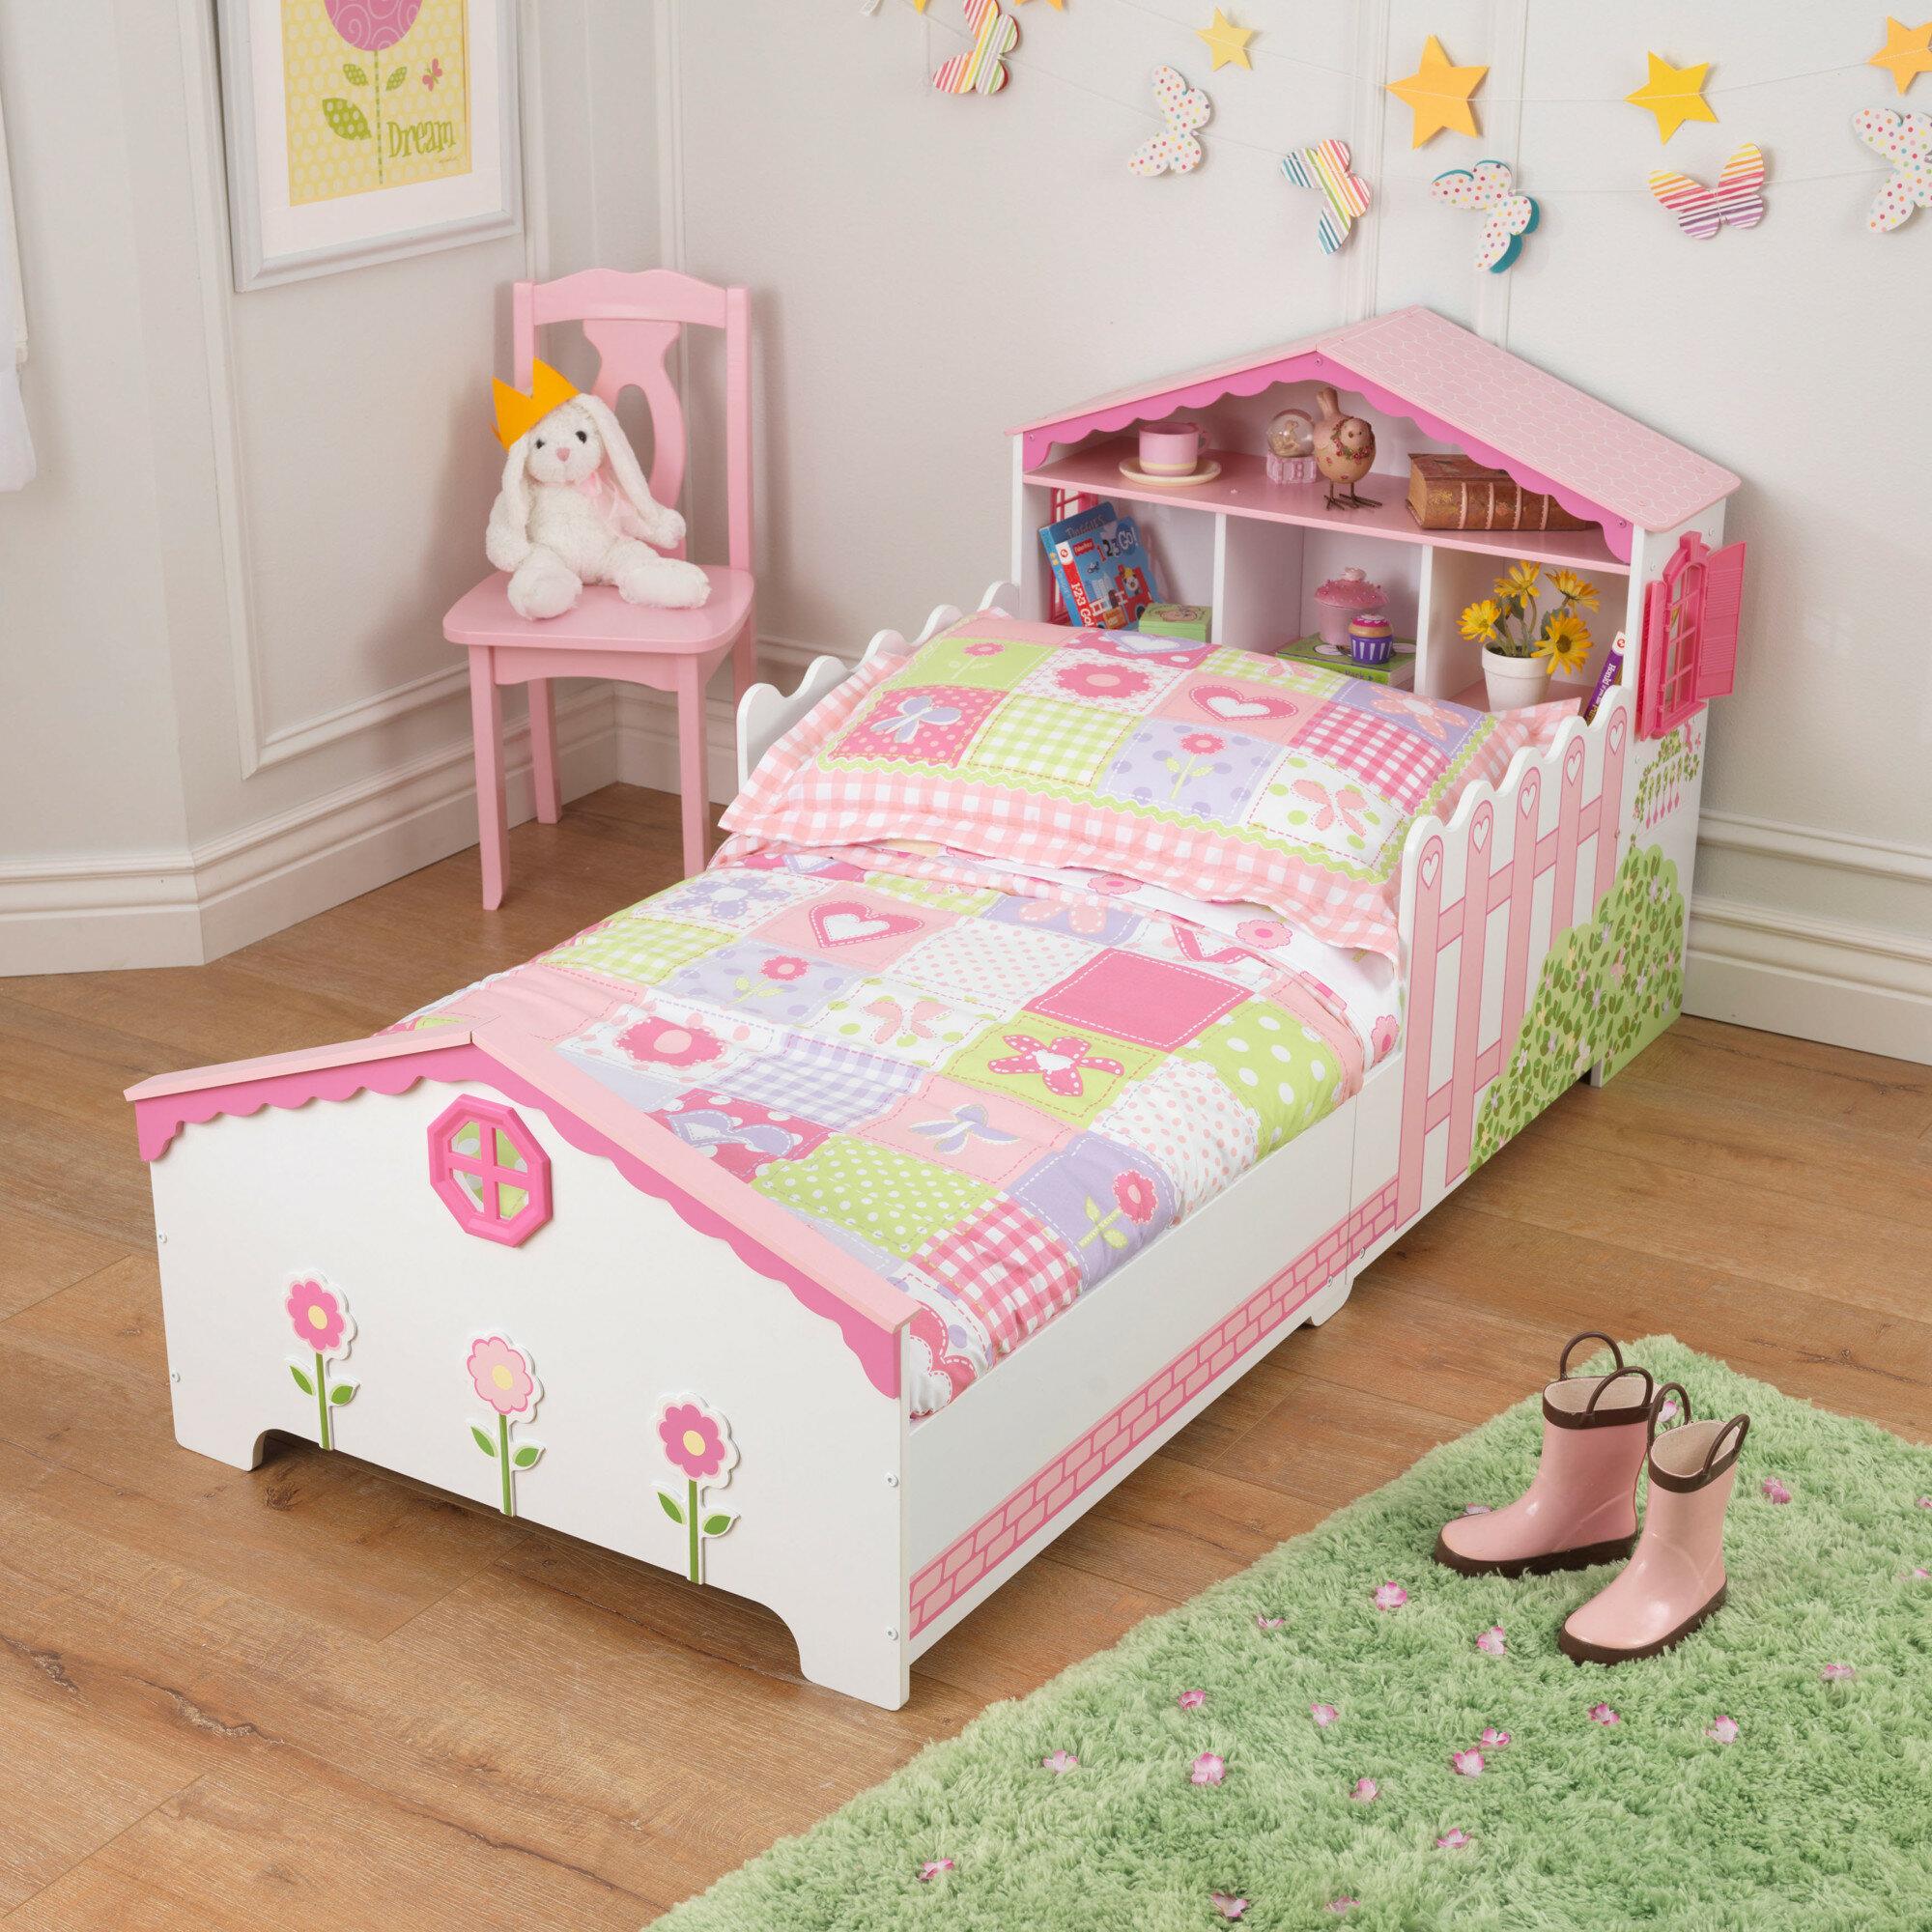 Kidkraft Dollhouse Toddler Bed Reviews Wayfair Co Uk